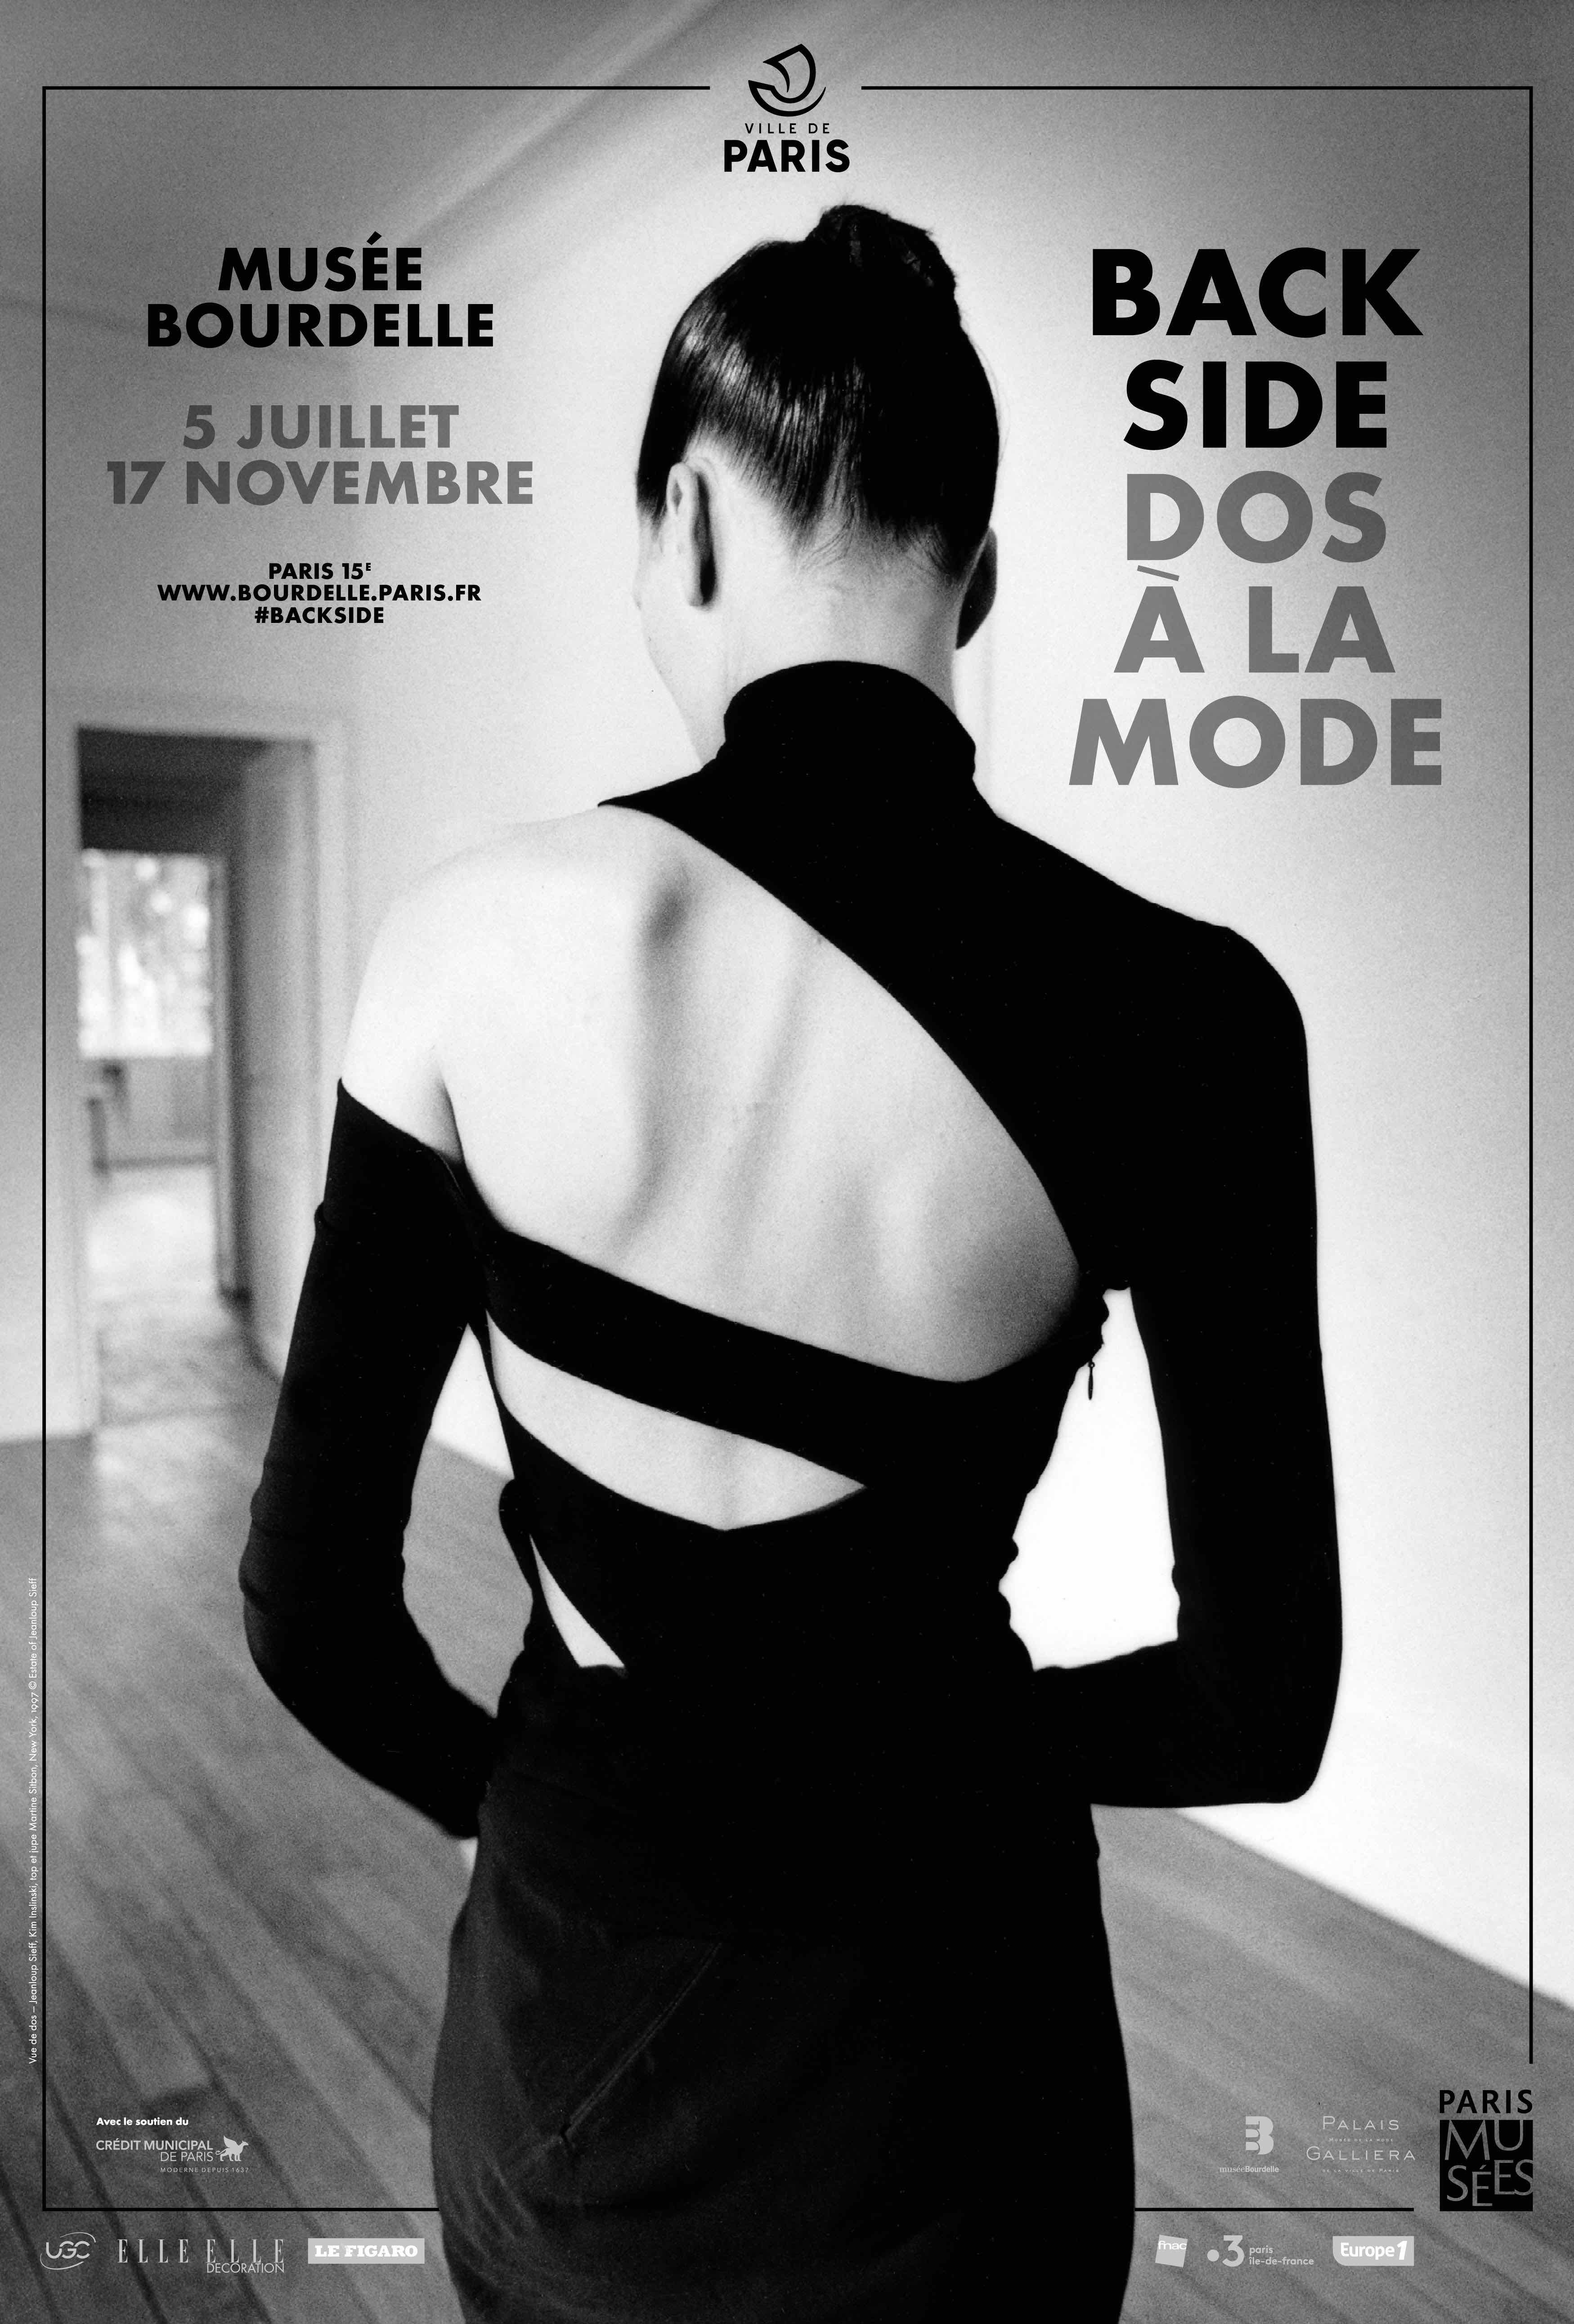 BACK SIDE - Dos à la Mode : Show at Musée Bourdelle opens on 5th July.